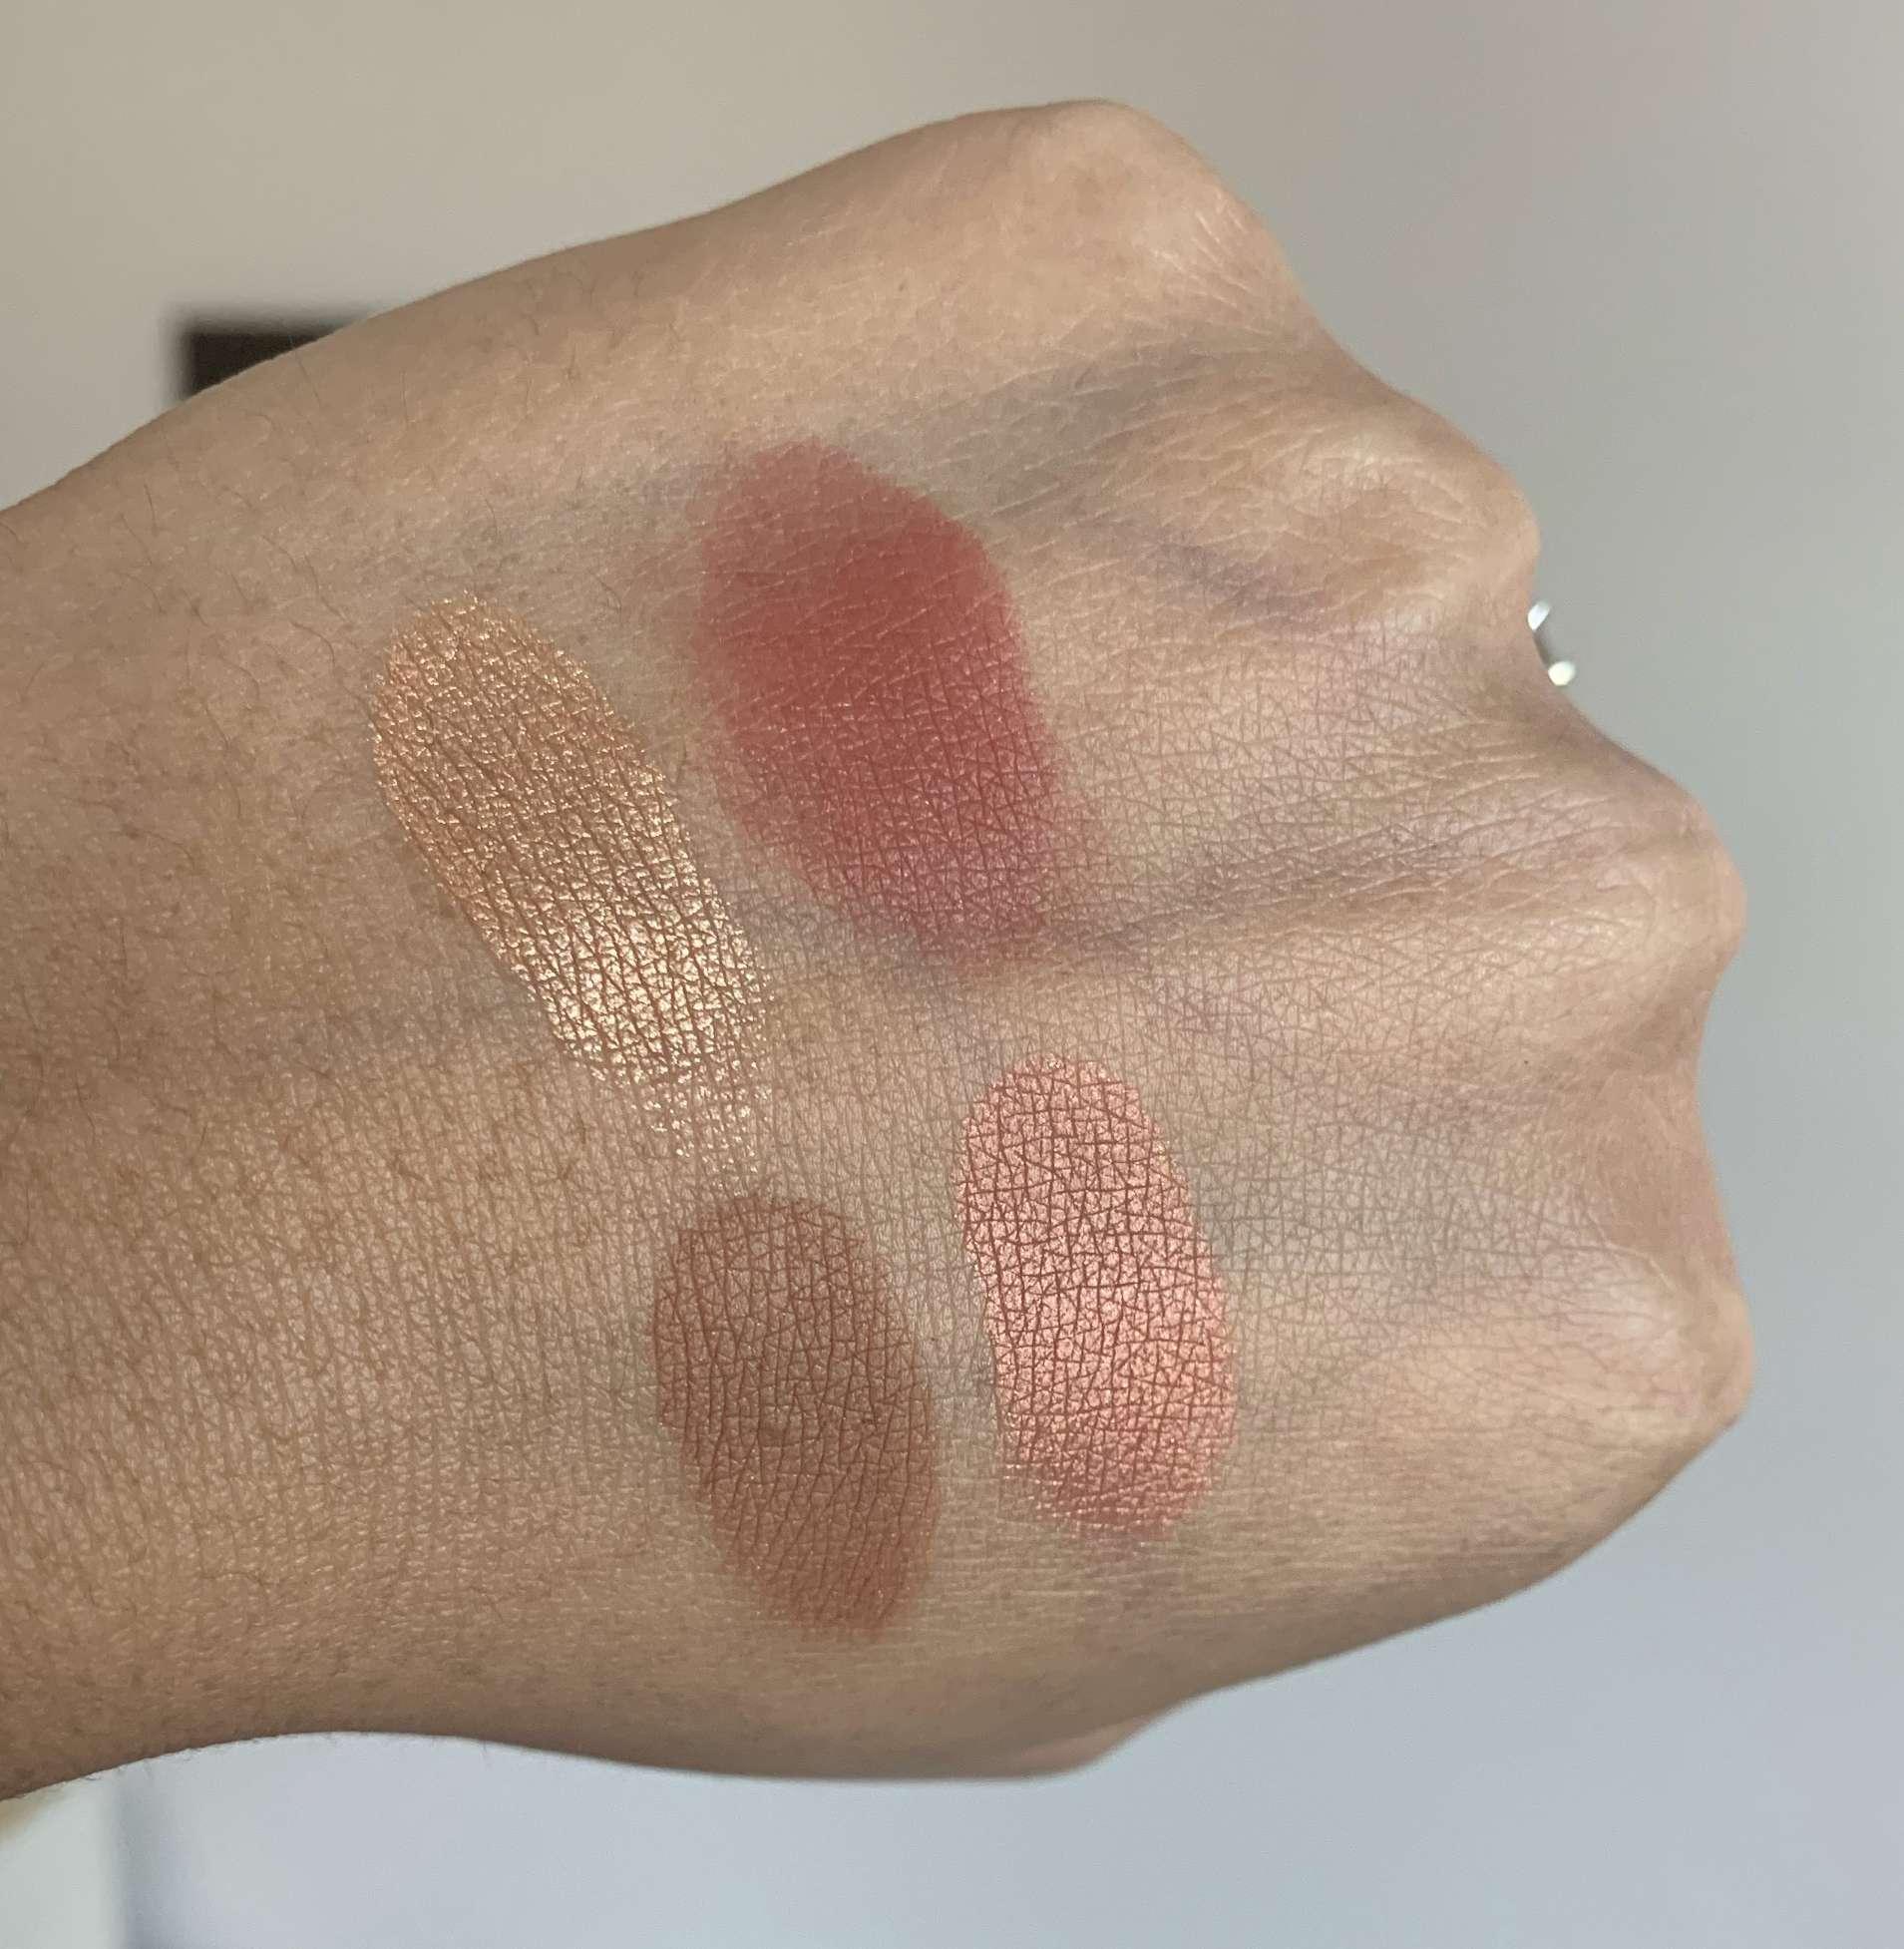 Sephora Microsmooth Multi-tasking Baked Face Palette in Captivate Swatches on Medium Dark Skin